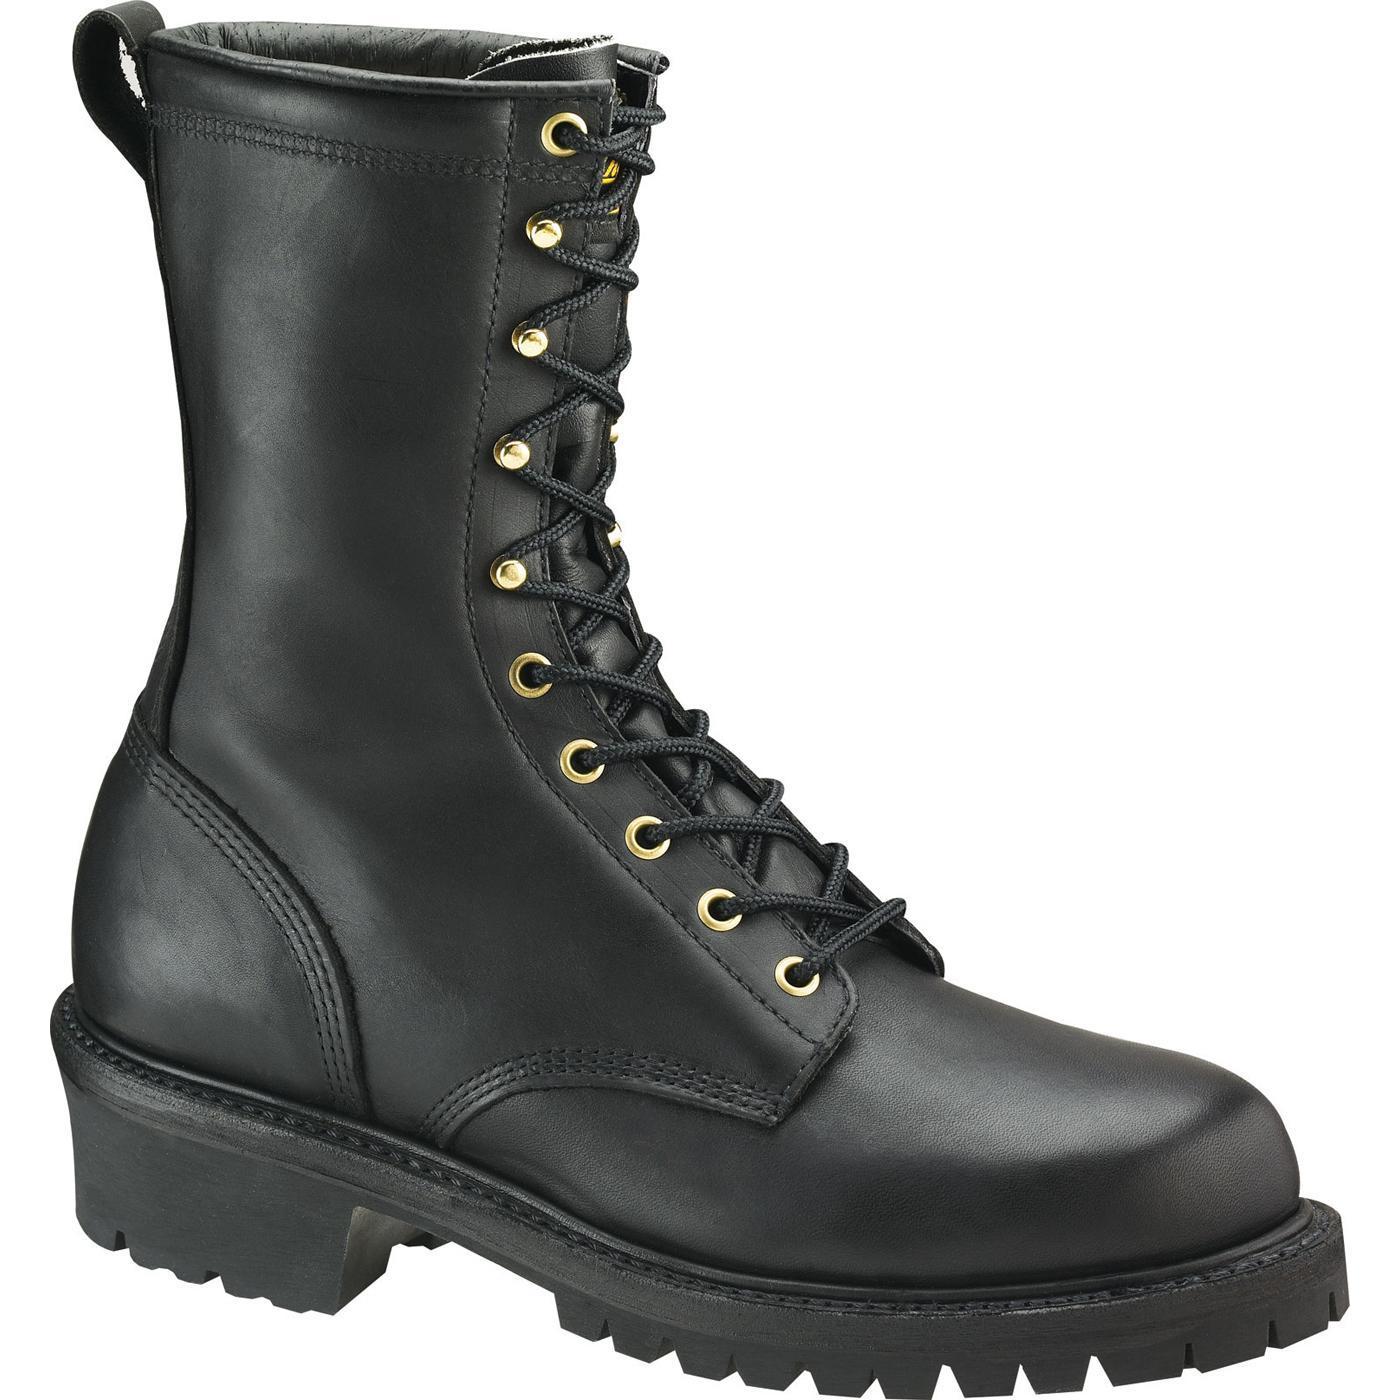 58edc7282b5 Thorogood Fire Devil Soft Toe Wildland Fire Boot